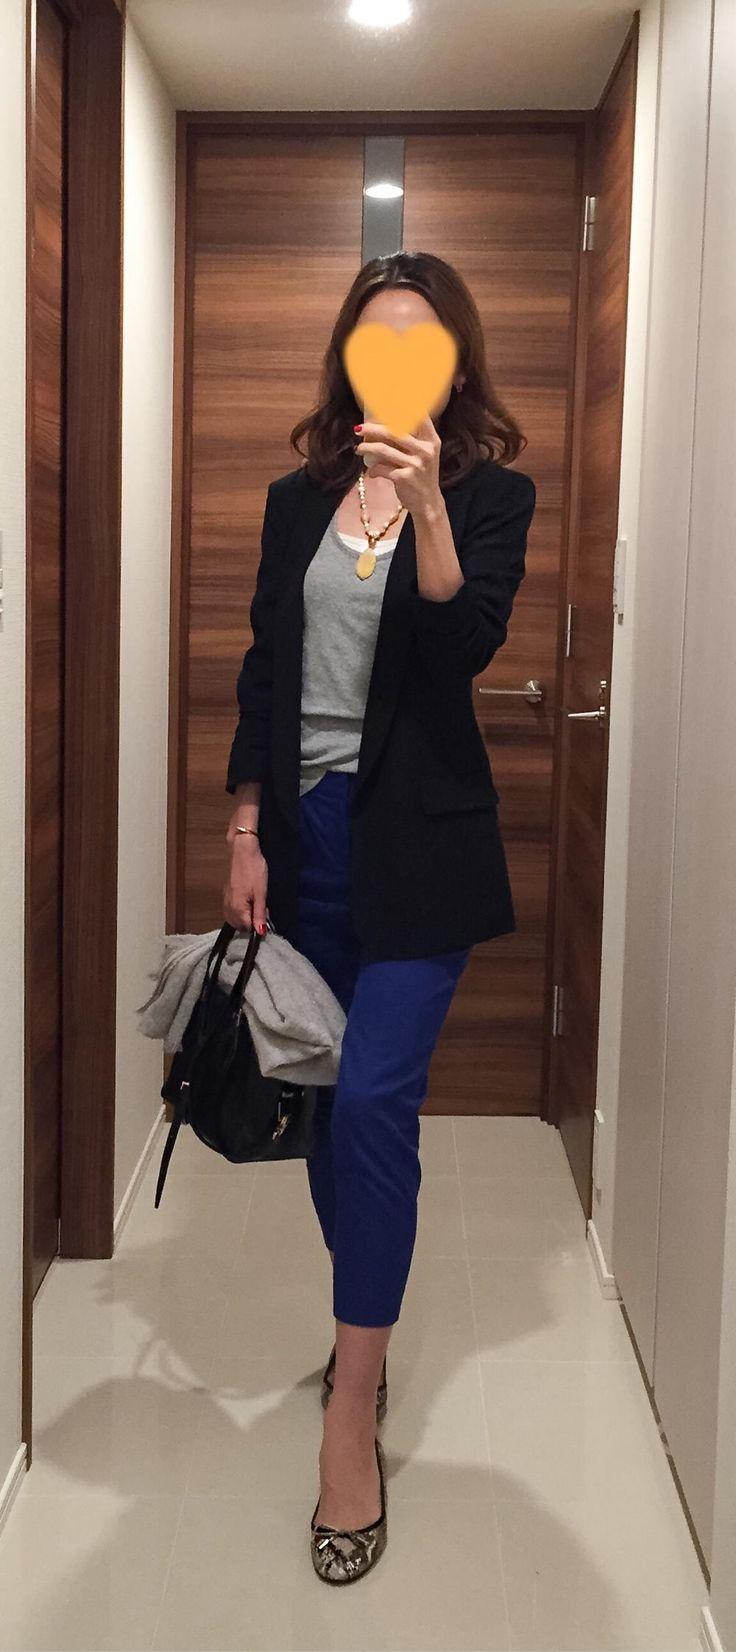 Black jacket: SISLEY, Grey tank: GAP, Blue pants: Nolley's, Bag: Tod's, Flats: Fabio Rusconi